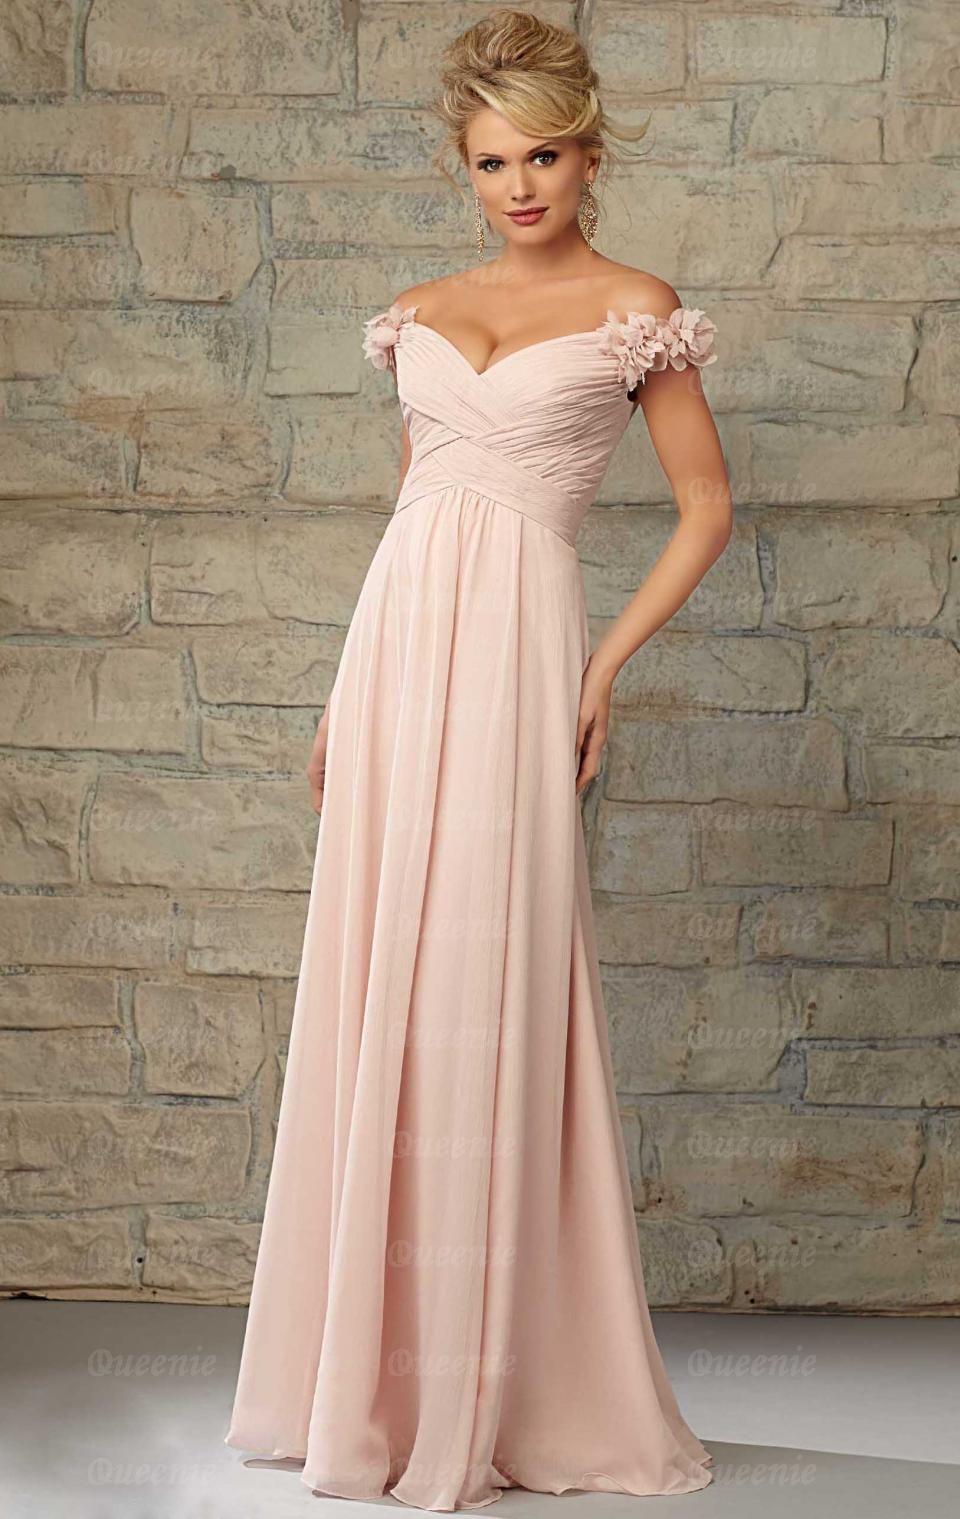 Elegant chiffon pink bridesmaid dresses pink bridesmaid dress elegant chiffon pink bridesmaid dresses ombrellifo Image collections